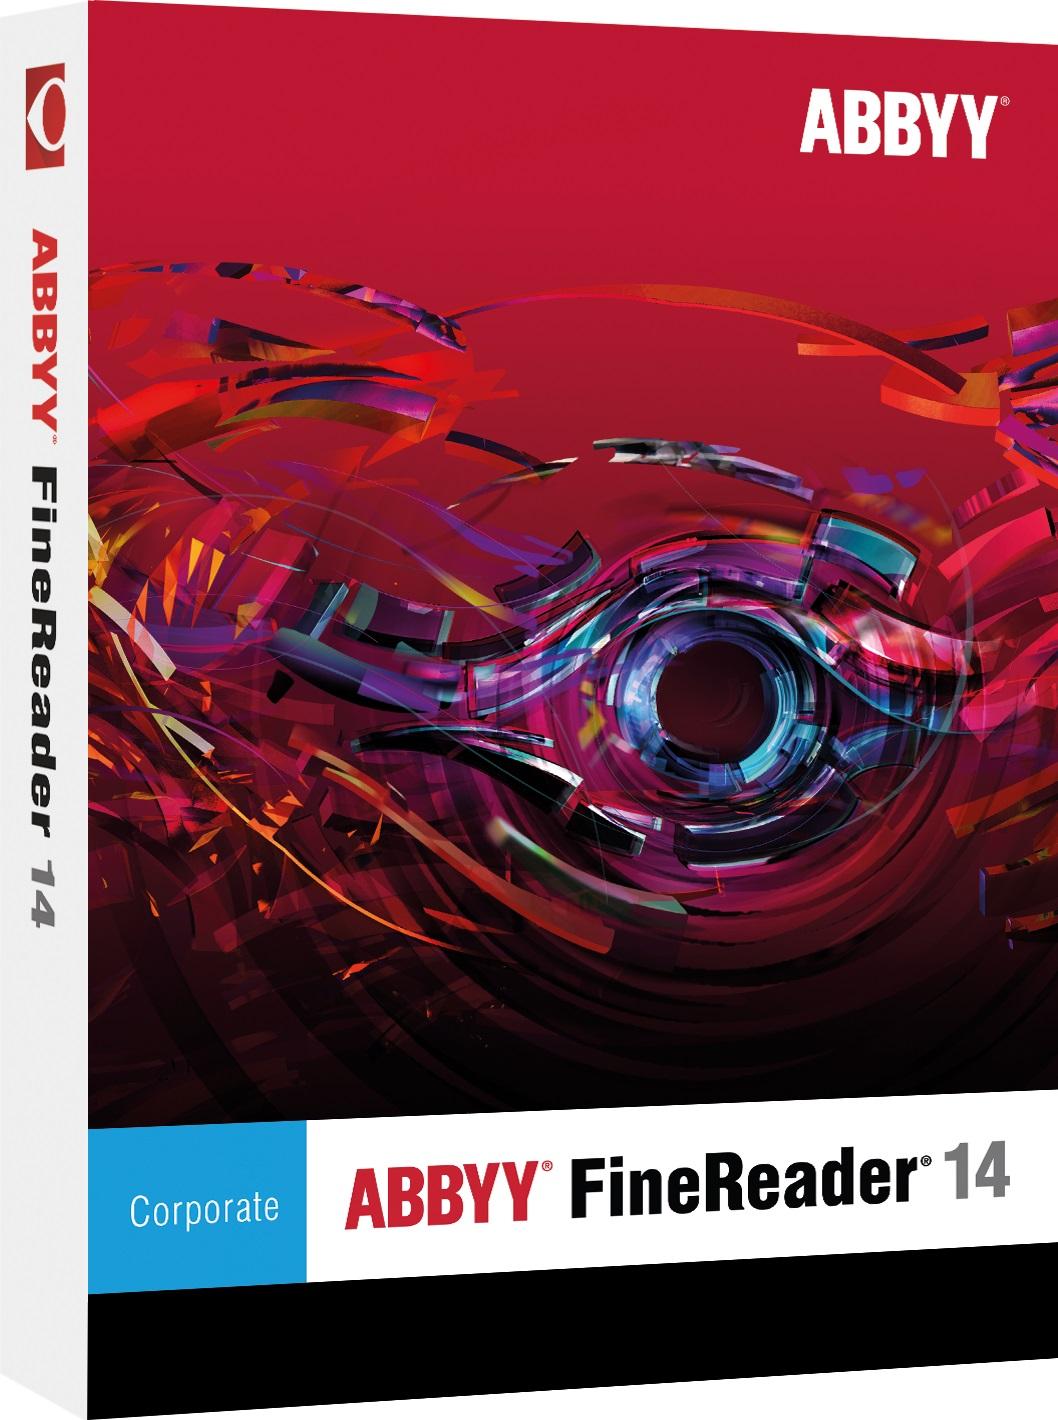 Corporate-abbyy-finereader14-box-l-rgb.jpg